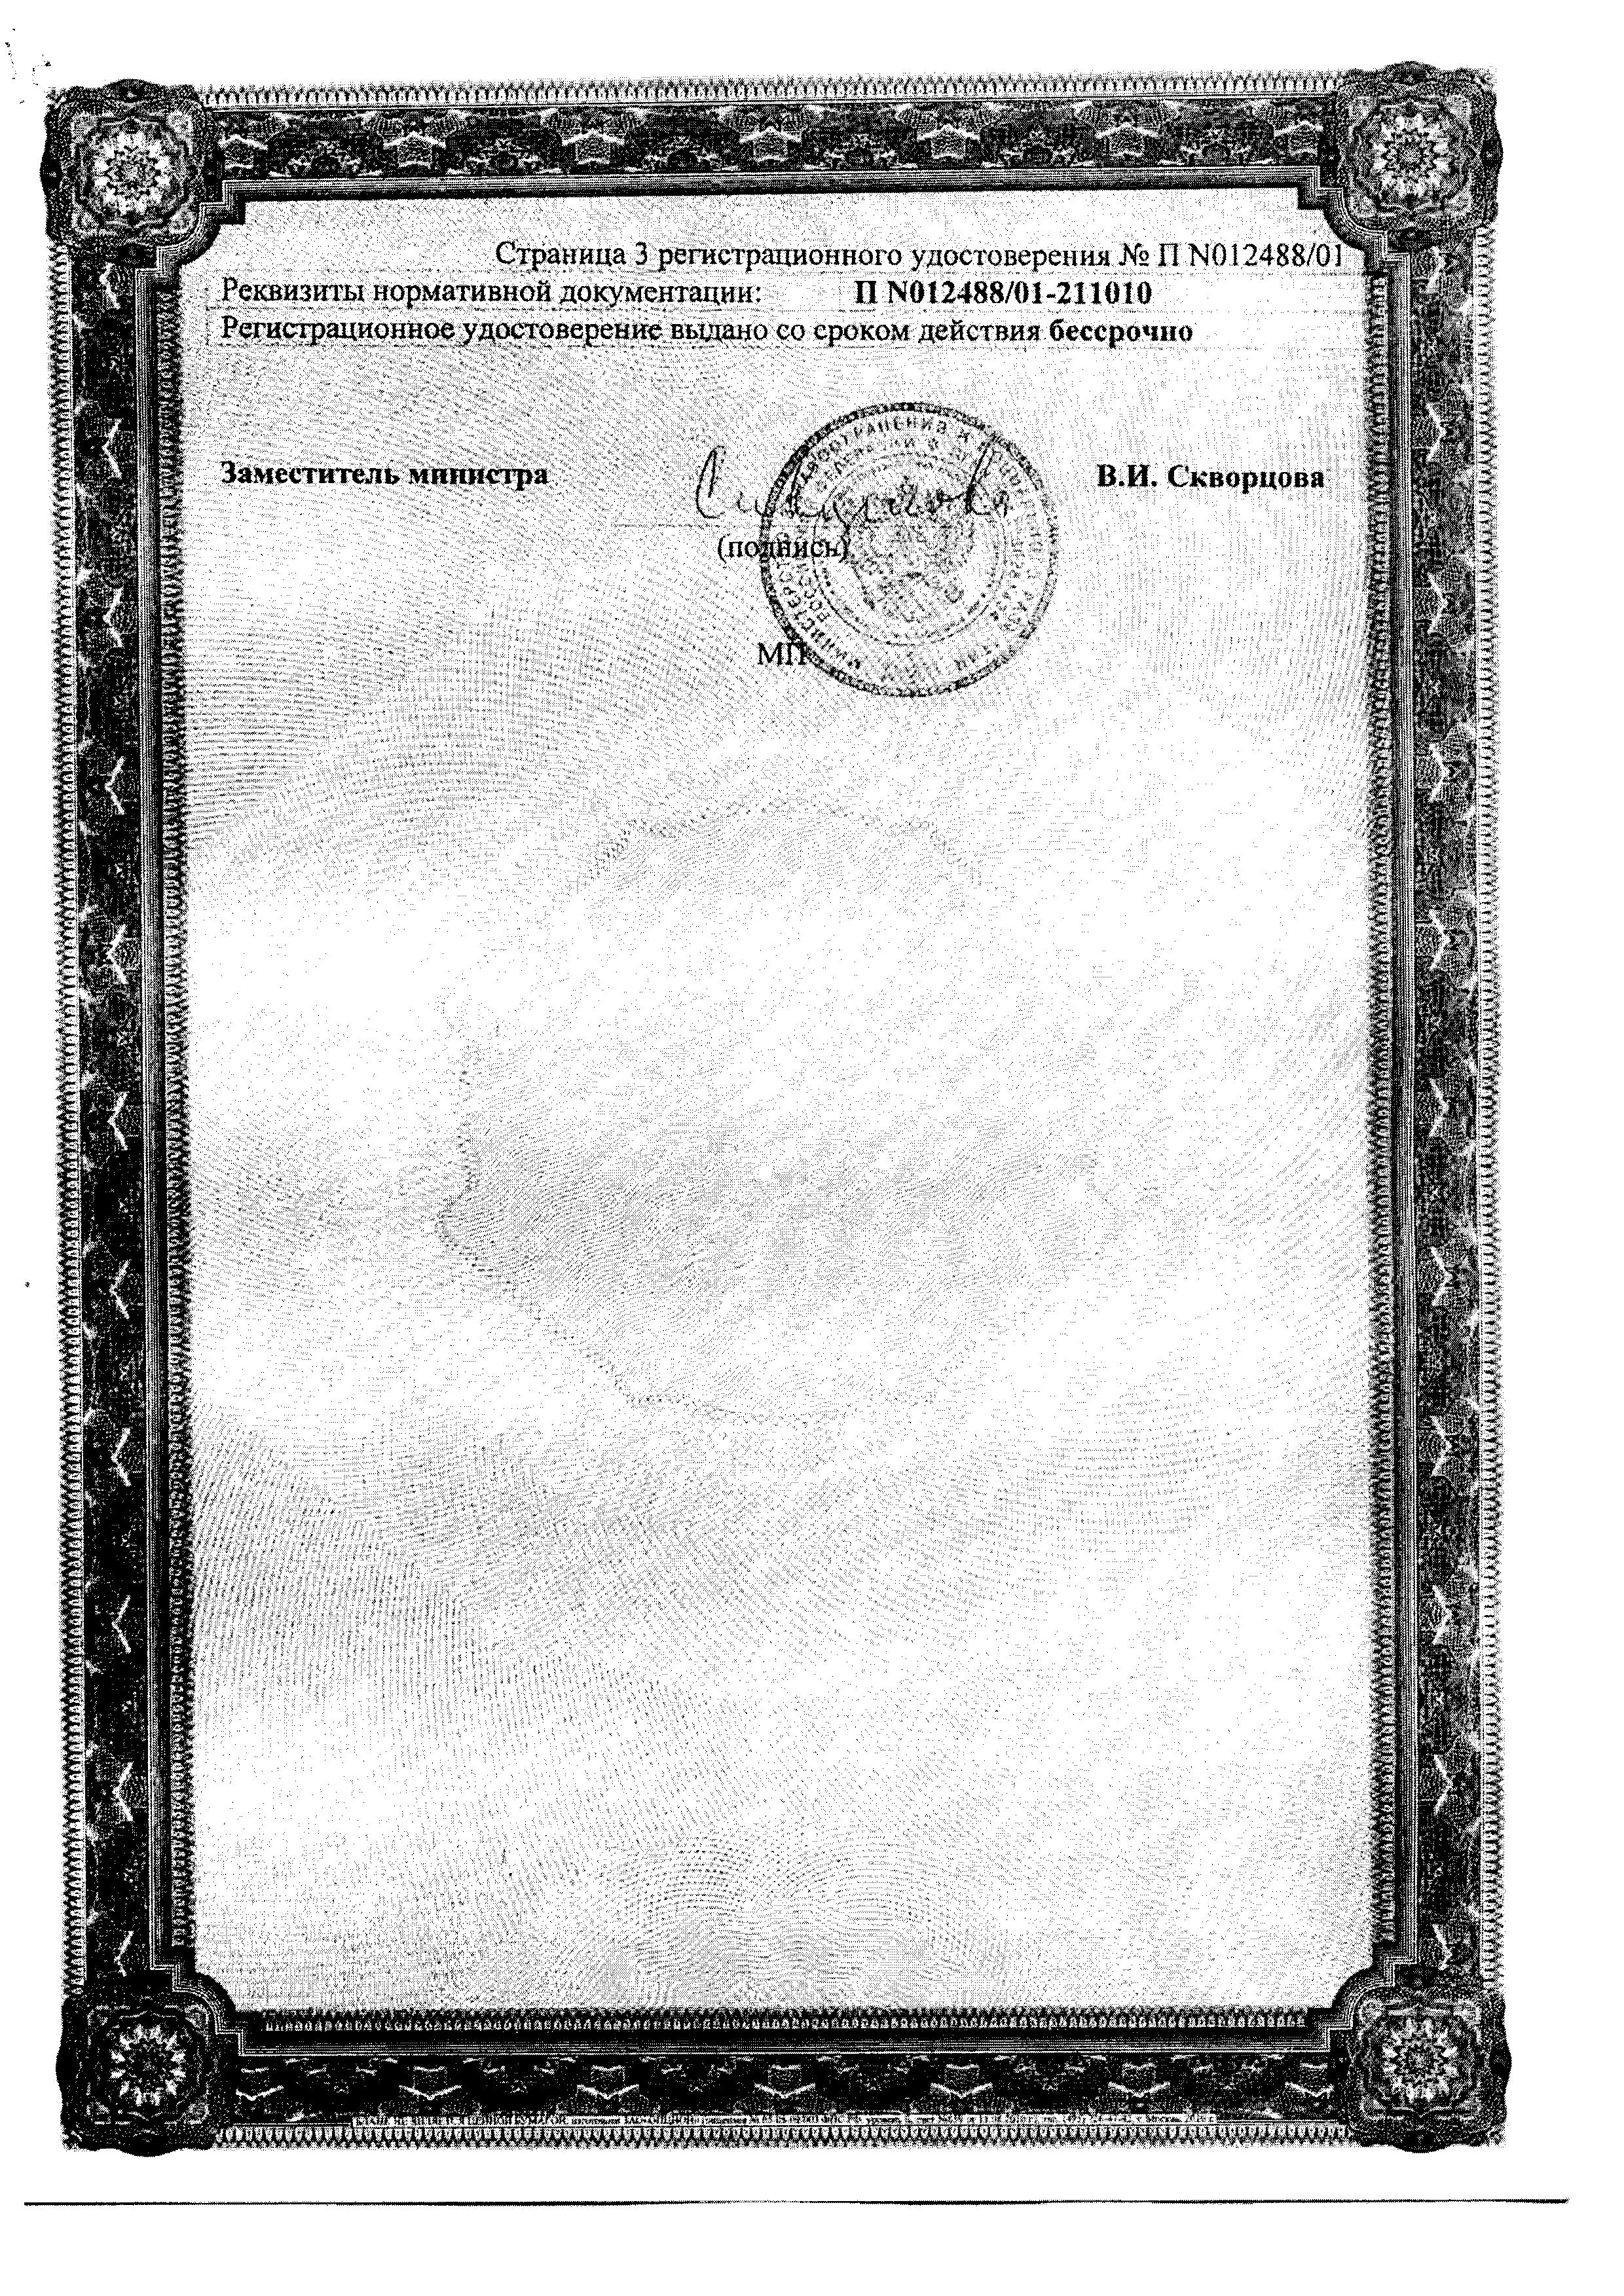 Плацента композитум сертификат